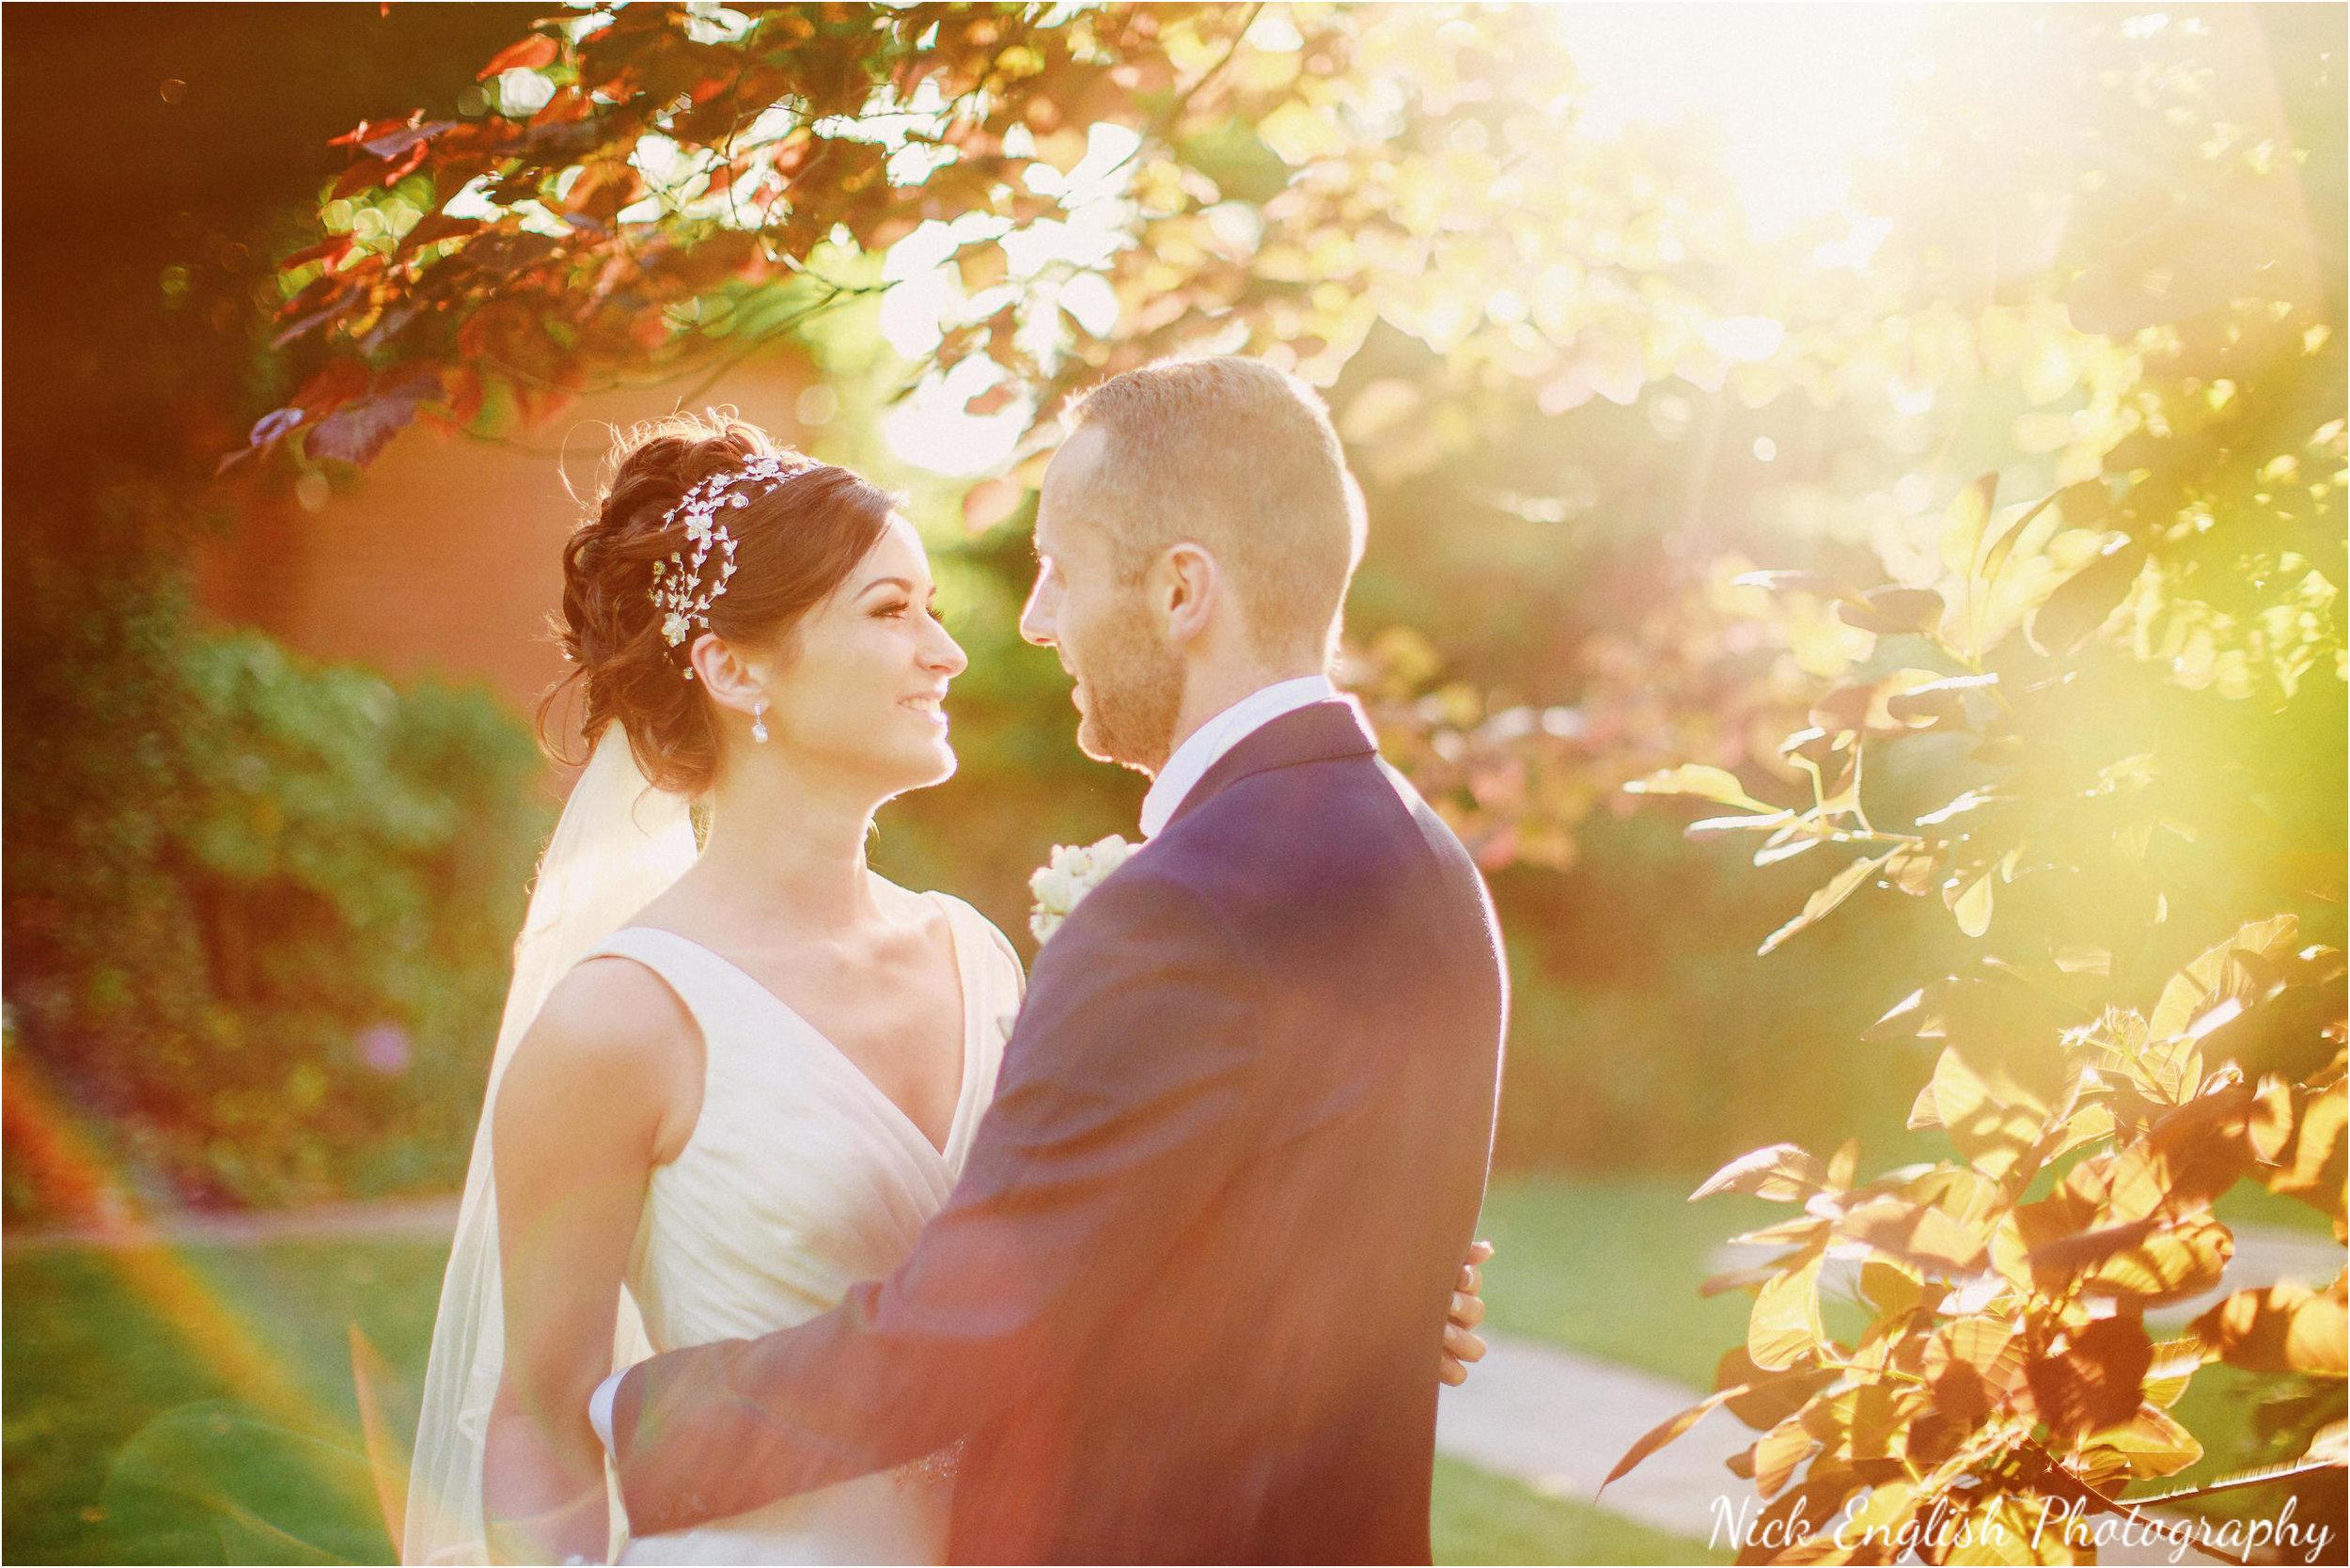 Emily David Wedding Photographs at Barton Grange Preston by Nick English Photography 198jpg.jpeg